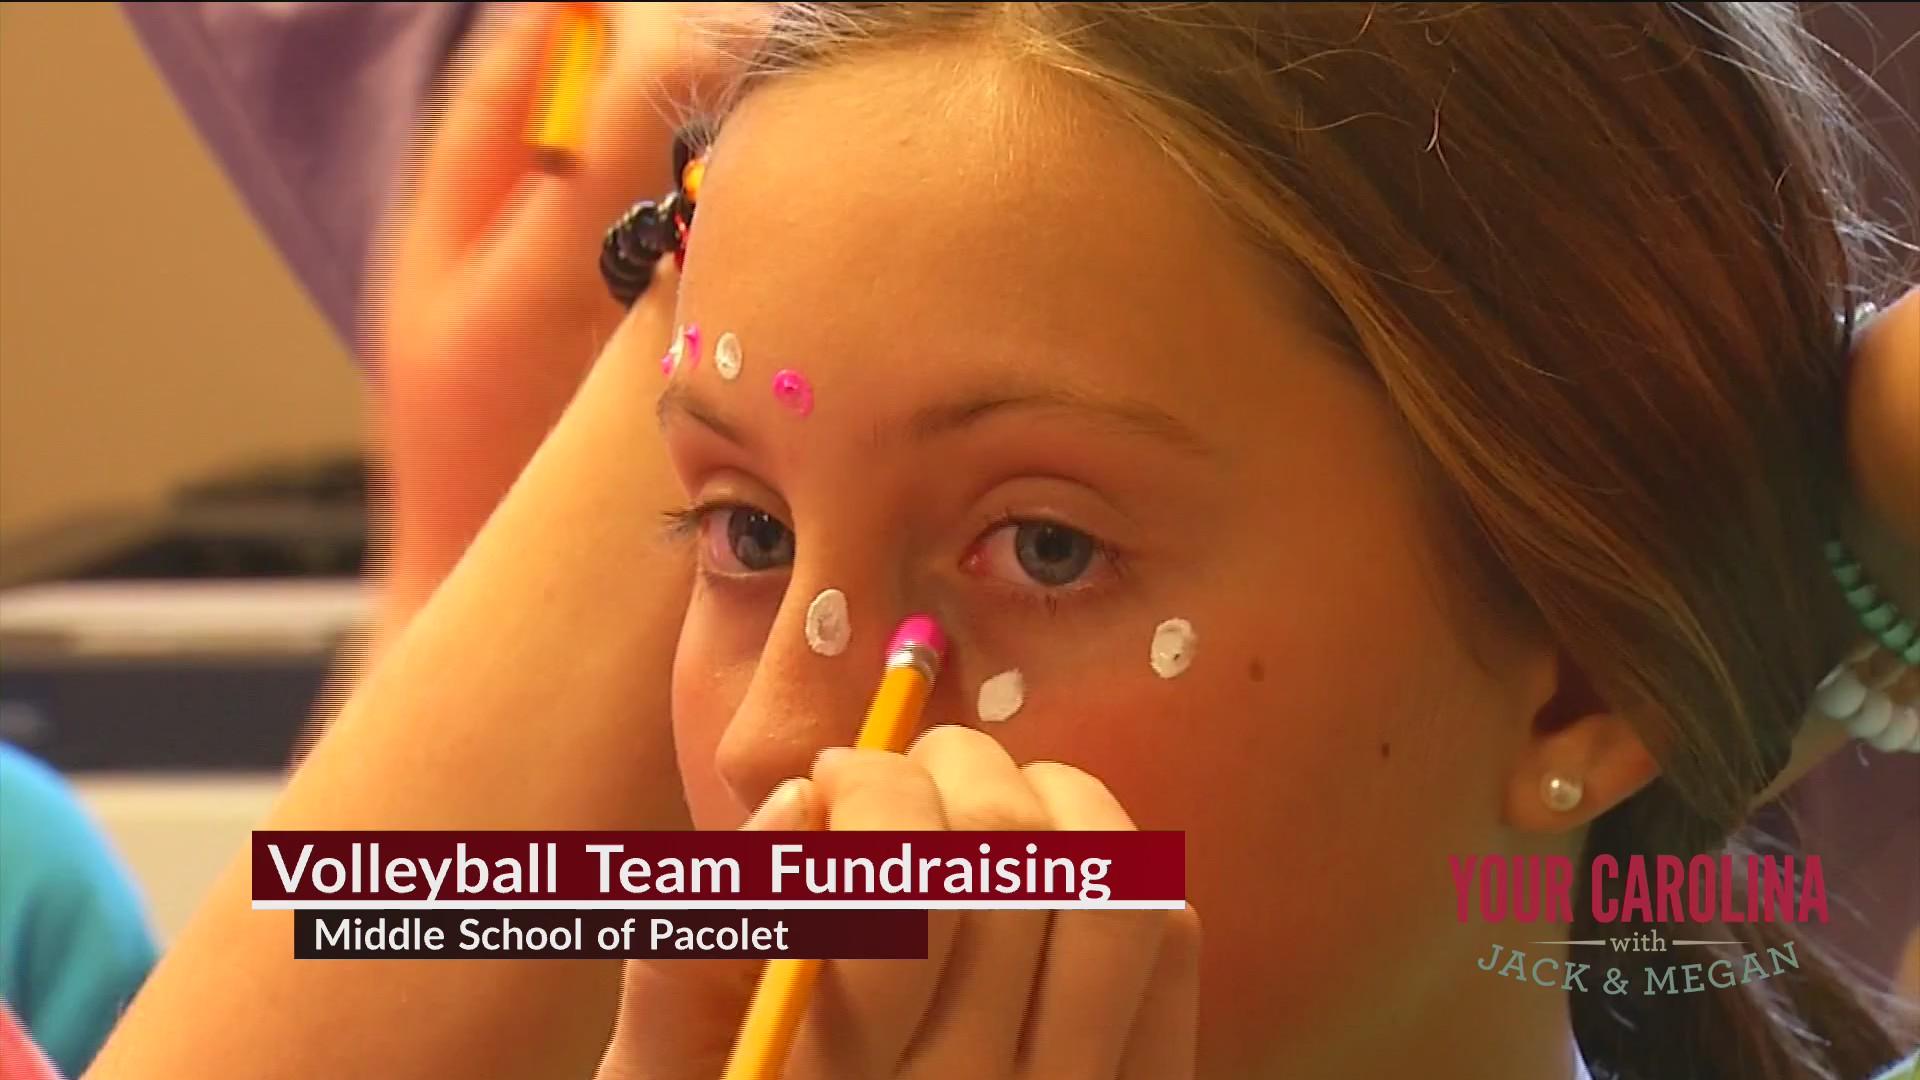 Good News - Volleyball Team Fundraising